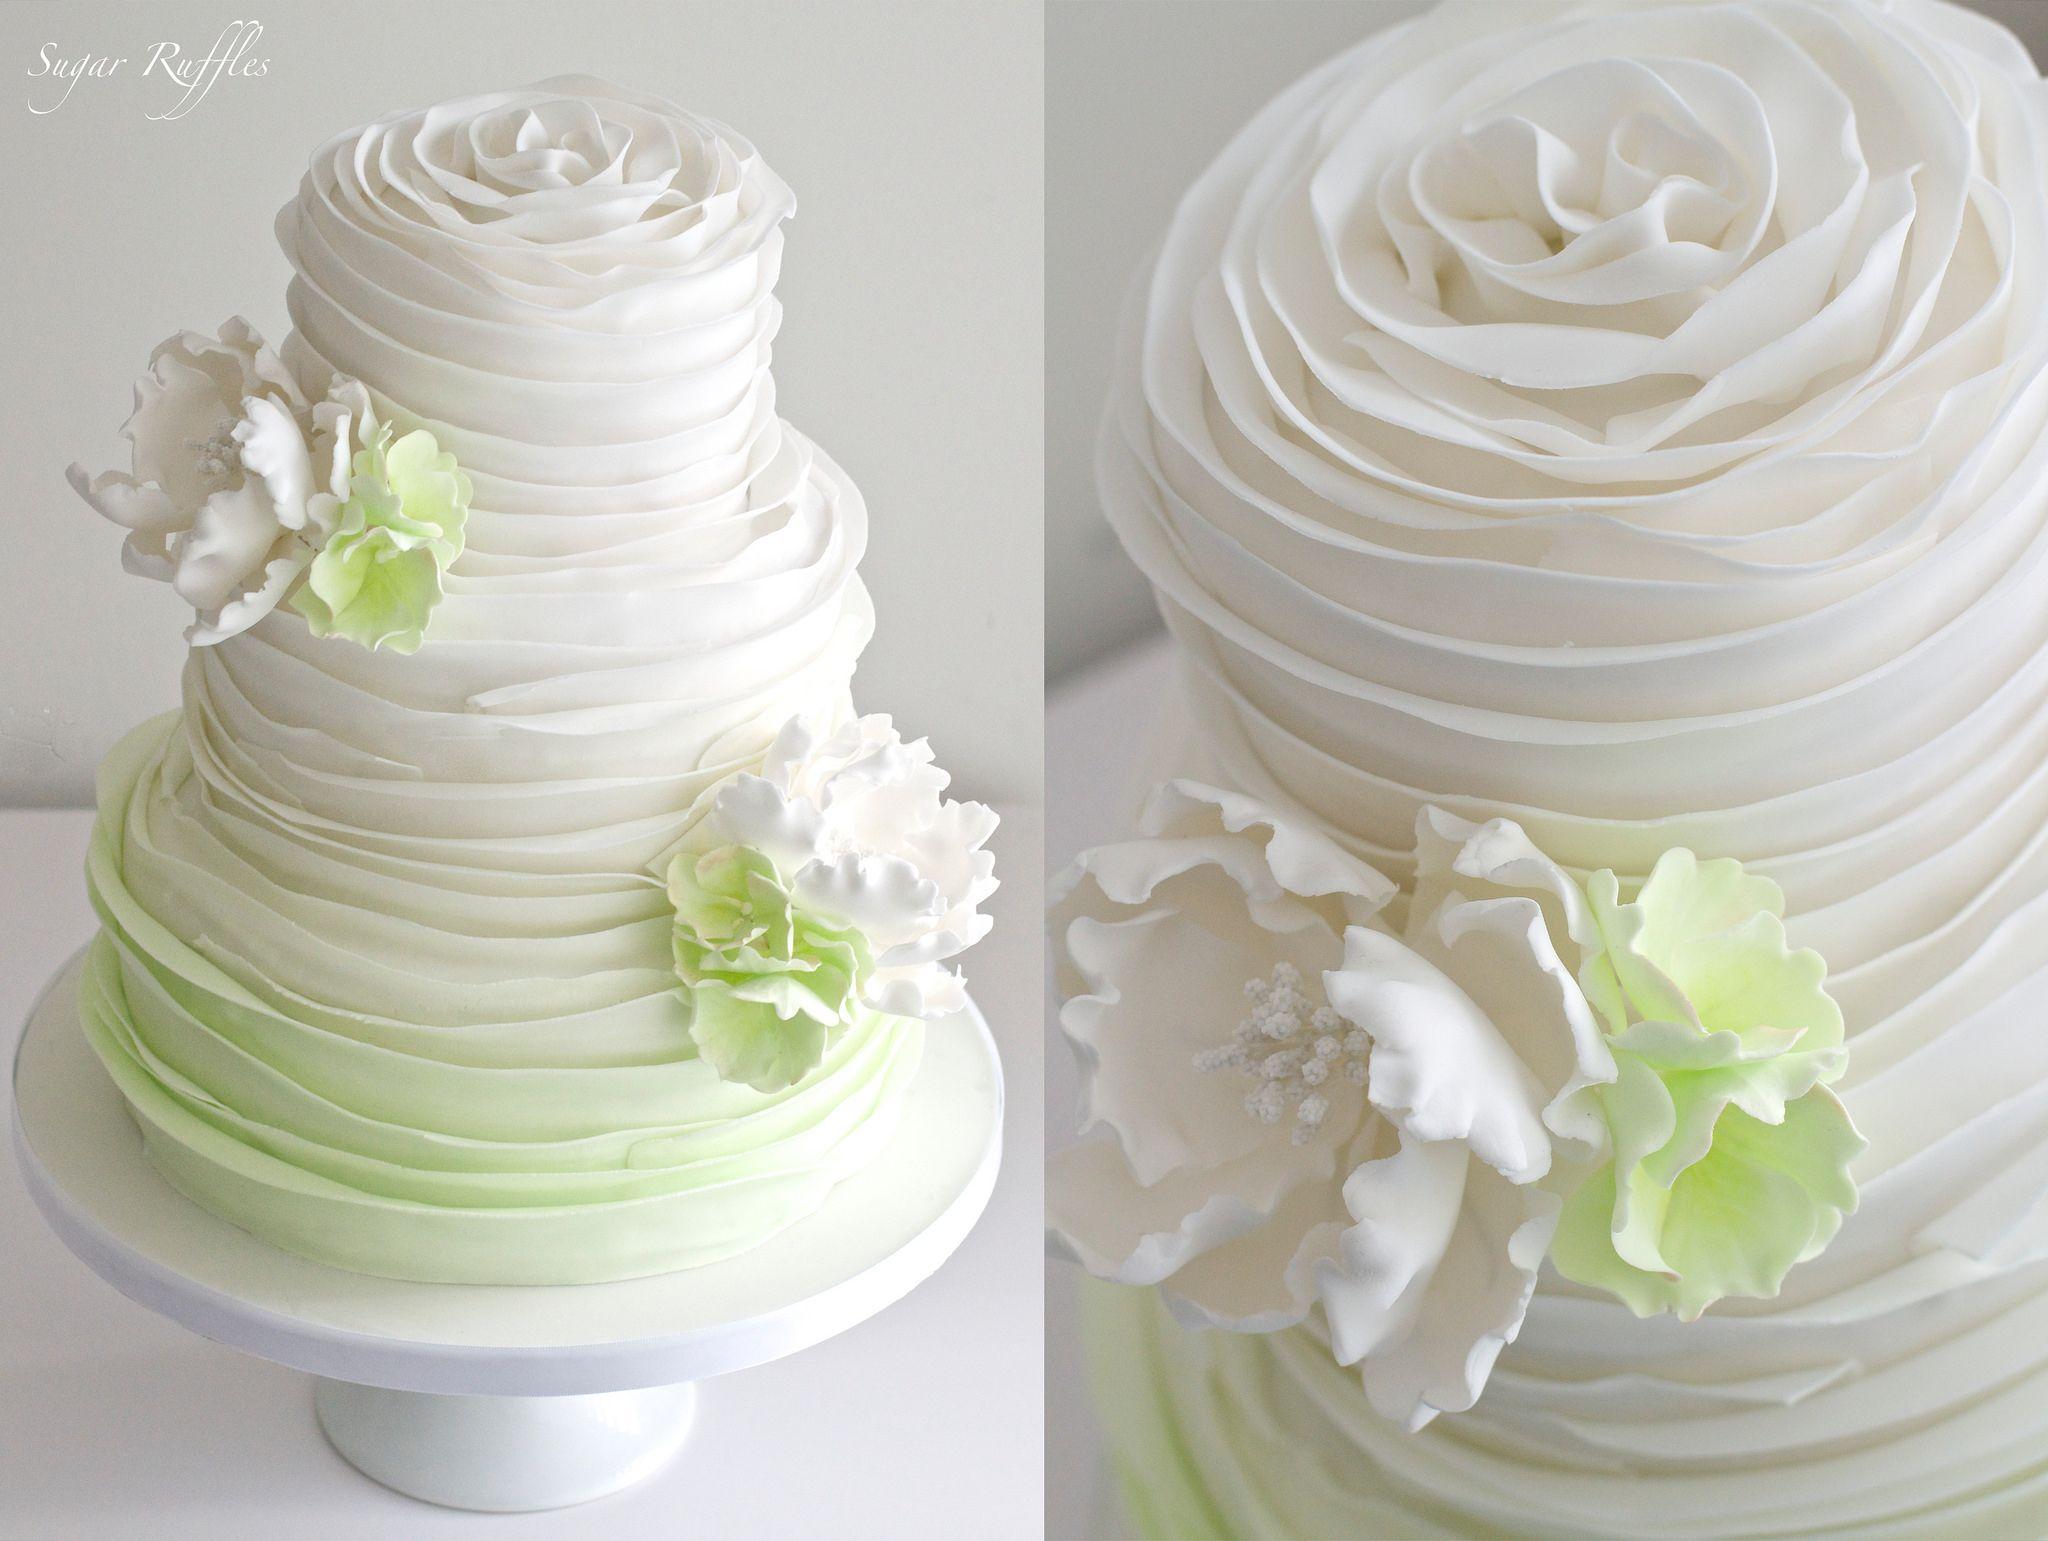 Green Ombre Ruffle Wedding Cake   Wedding cake, Cake and Sugaring